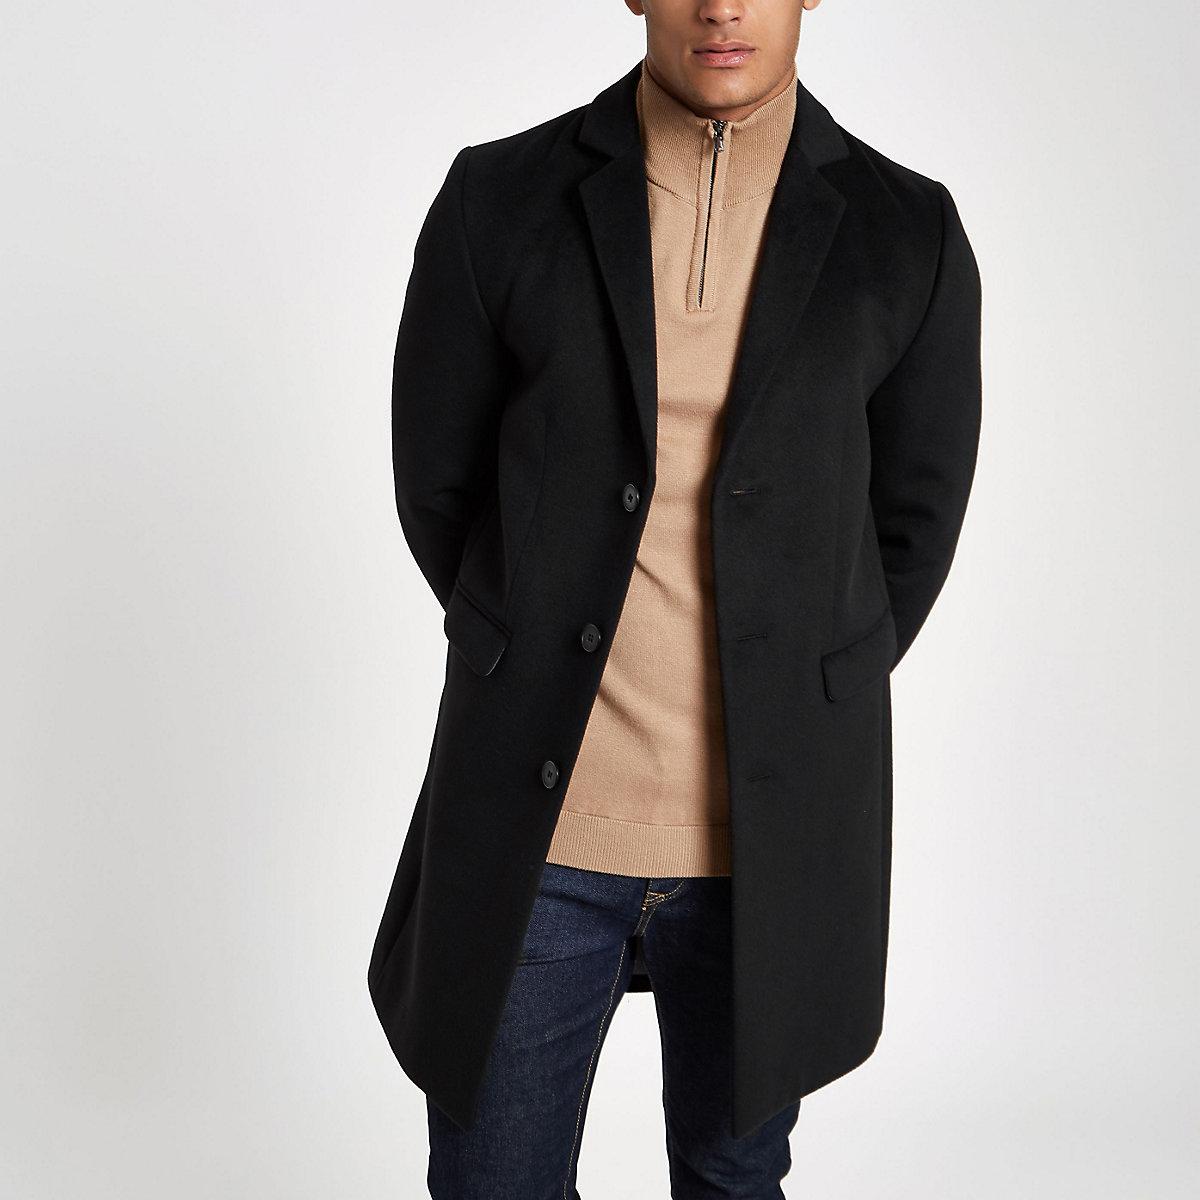 Black button-down overcoat